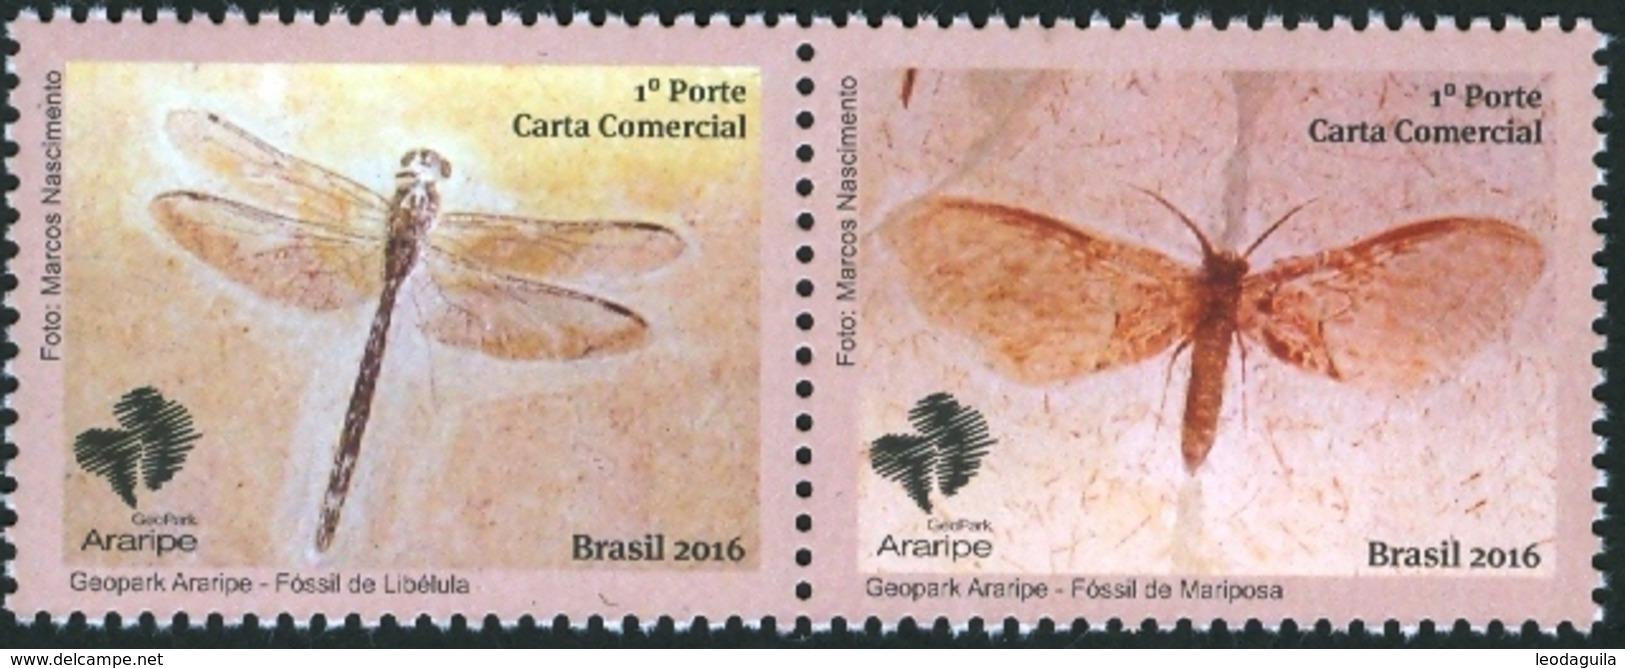 BRAZIL 2016  -  ARARIPE  GEOPARK   -  2v   MNH - Brazil